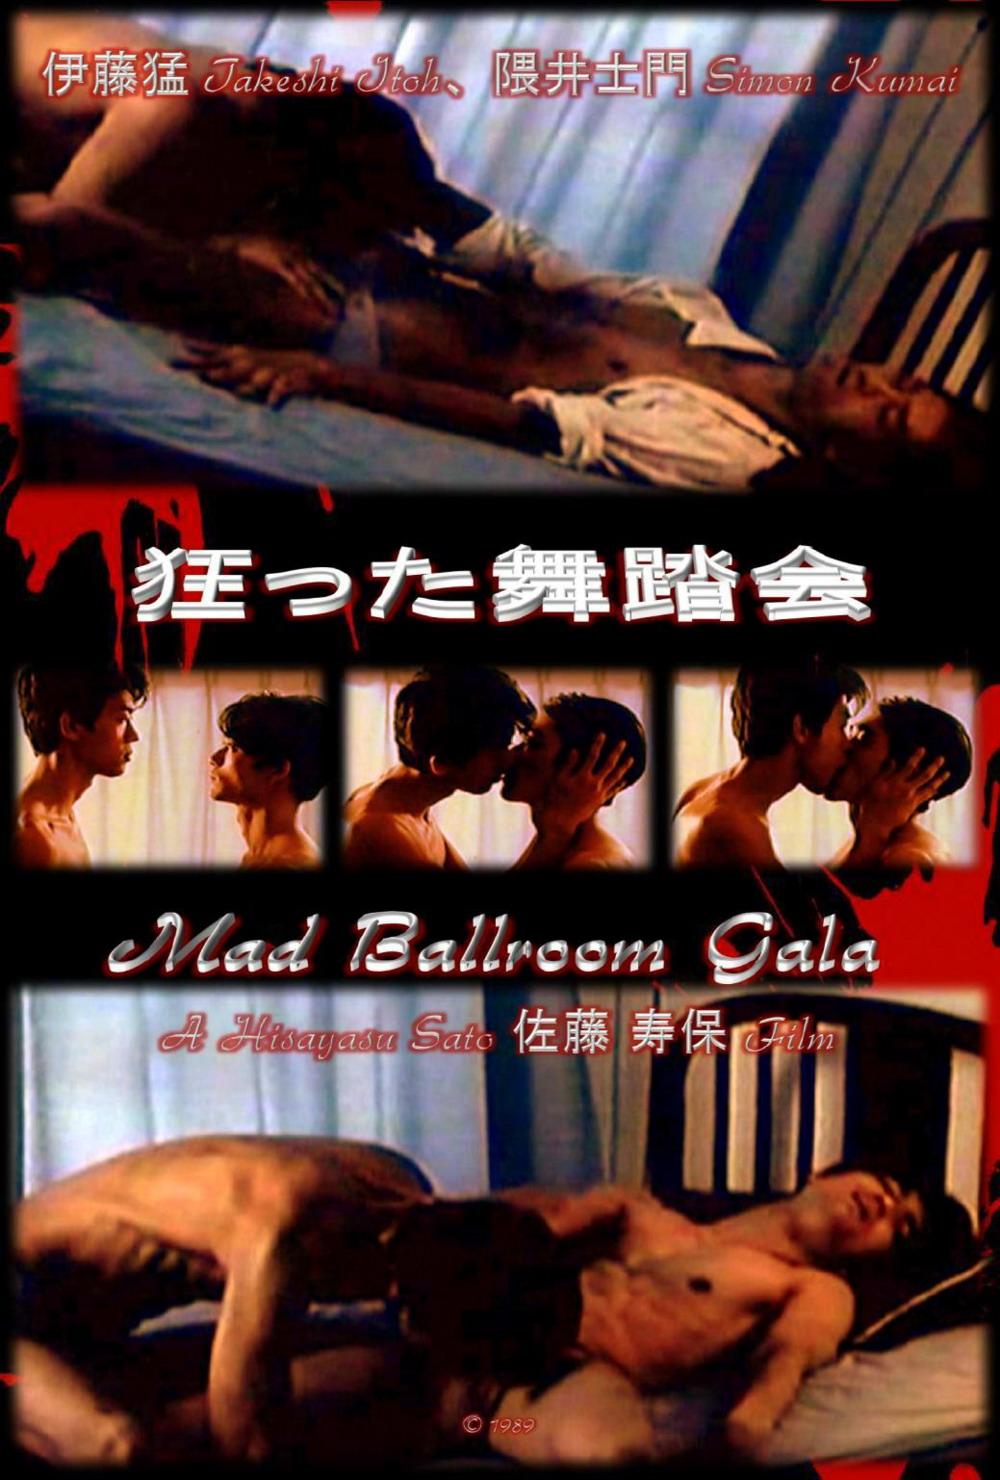 Mad Ballroom Gala (1989) 狂った舞踏会